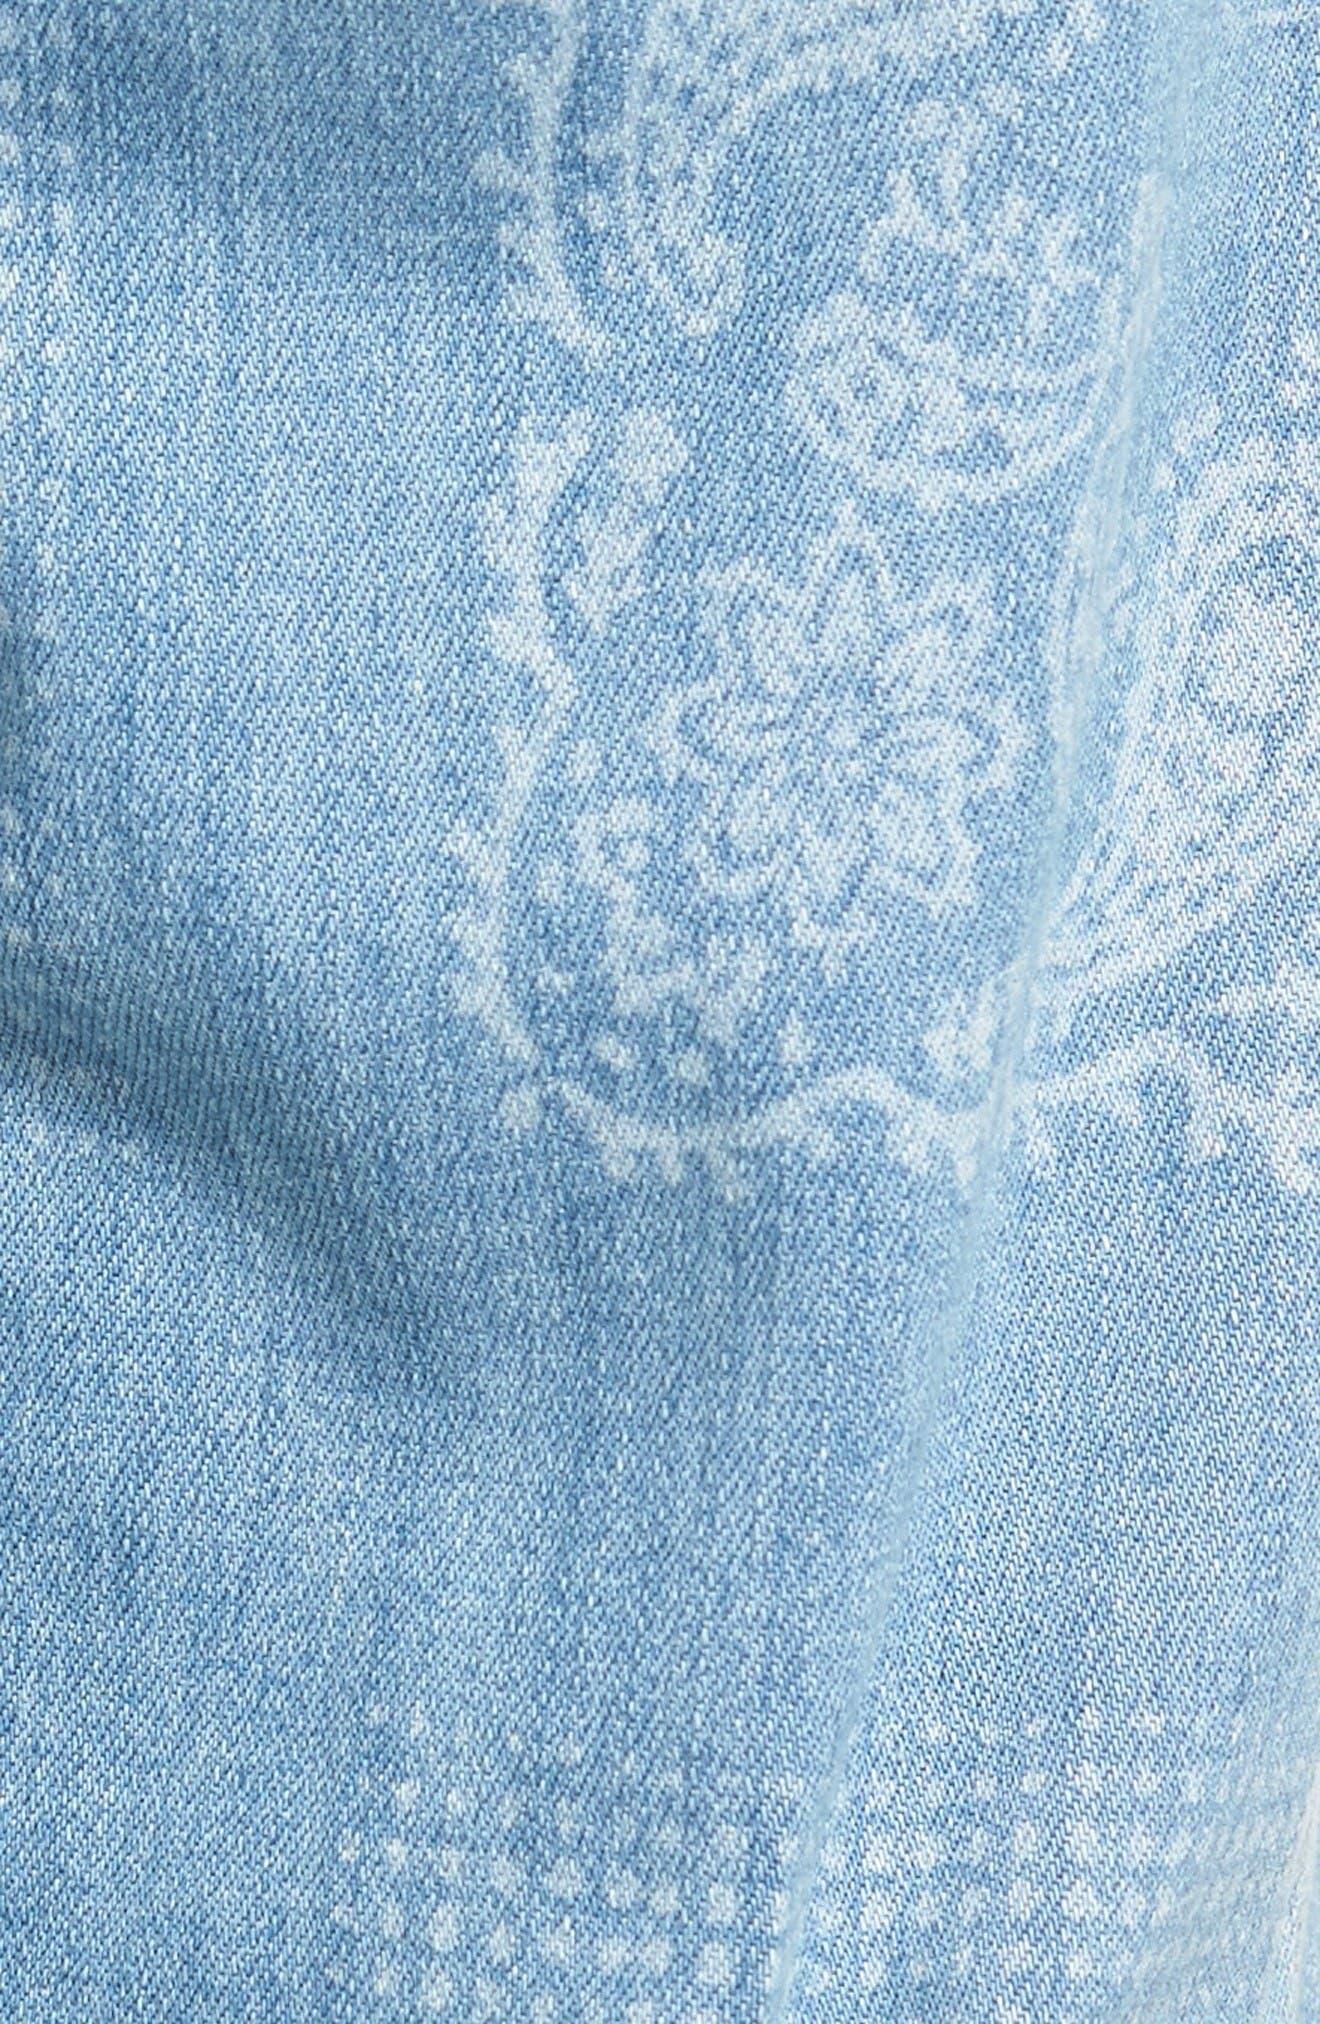 Alternate Image 5  - NYDJ Jessica Print Relaxed Boyfriend Jeans (Bandana) (Regular & Petite)